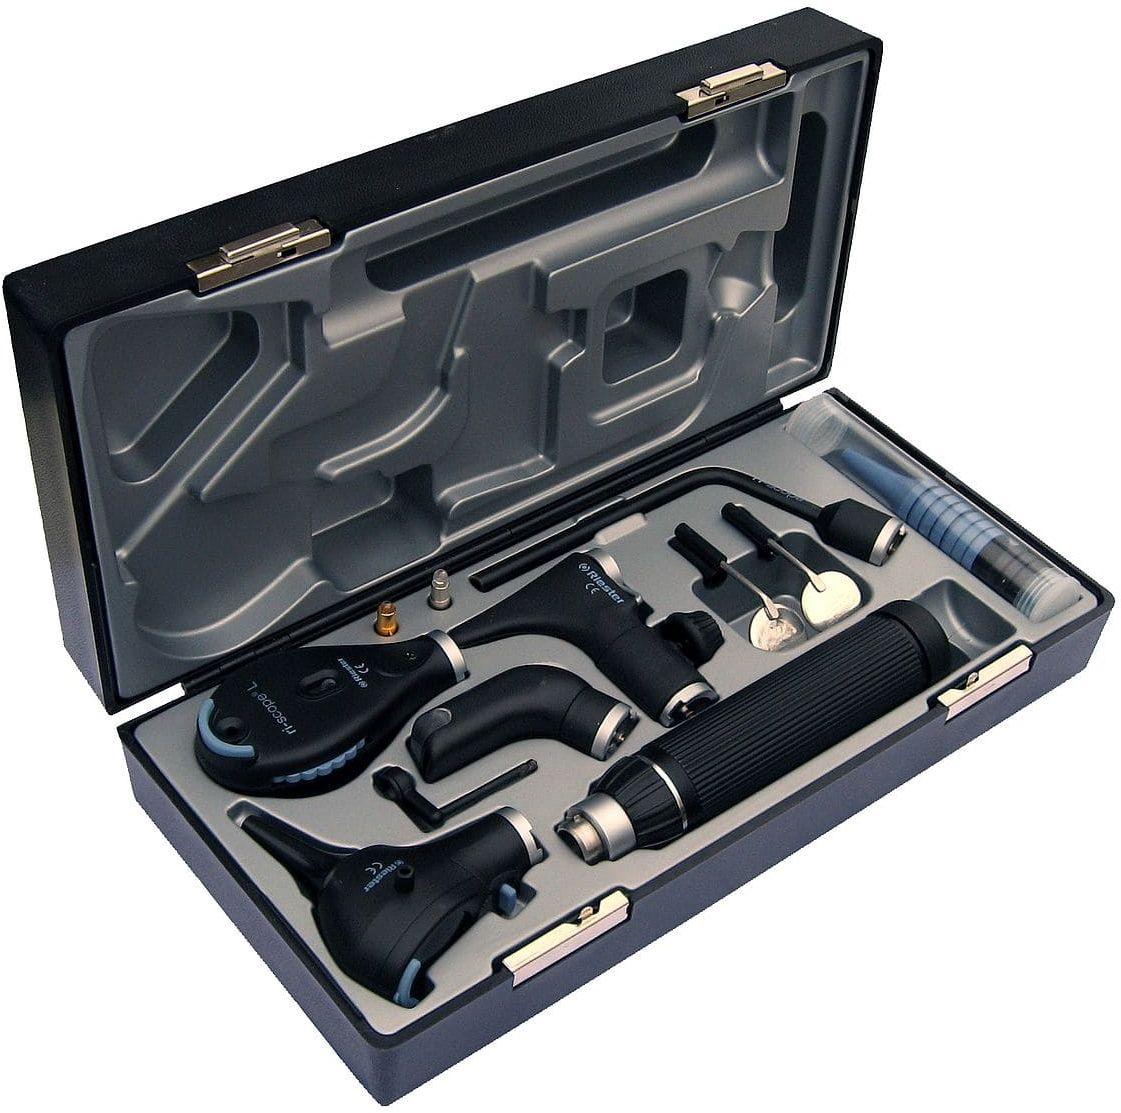 Riester ri-scope zestaw de-luxe otoskop L3 LED 3,5 V + oftalmoskop L2 LED 3,5 V rękojeść bateryjna typu C